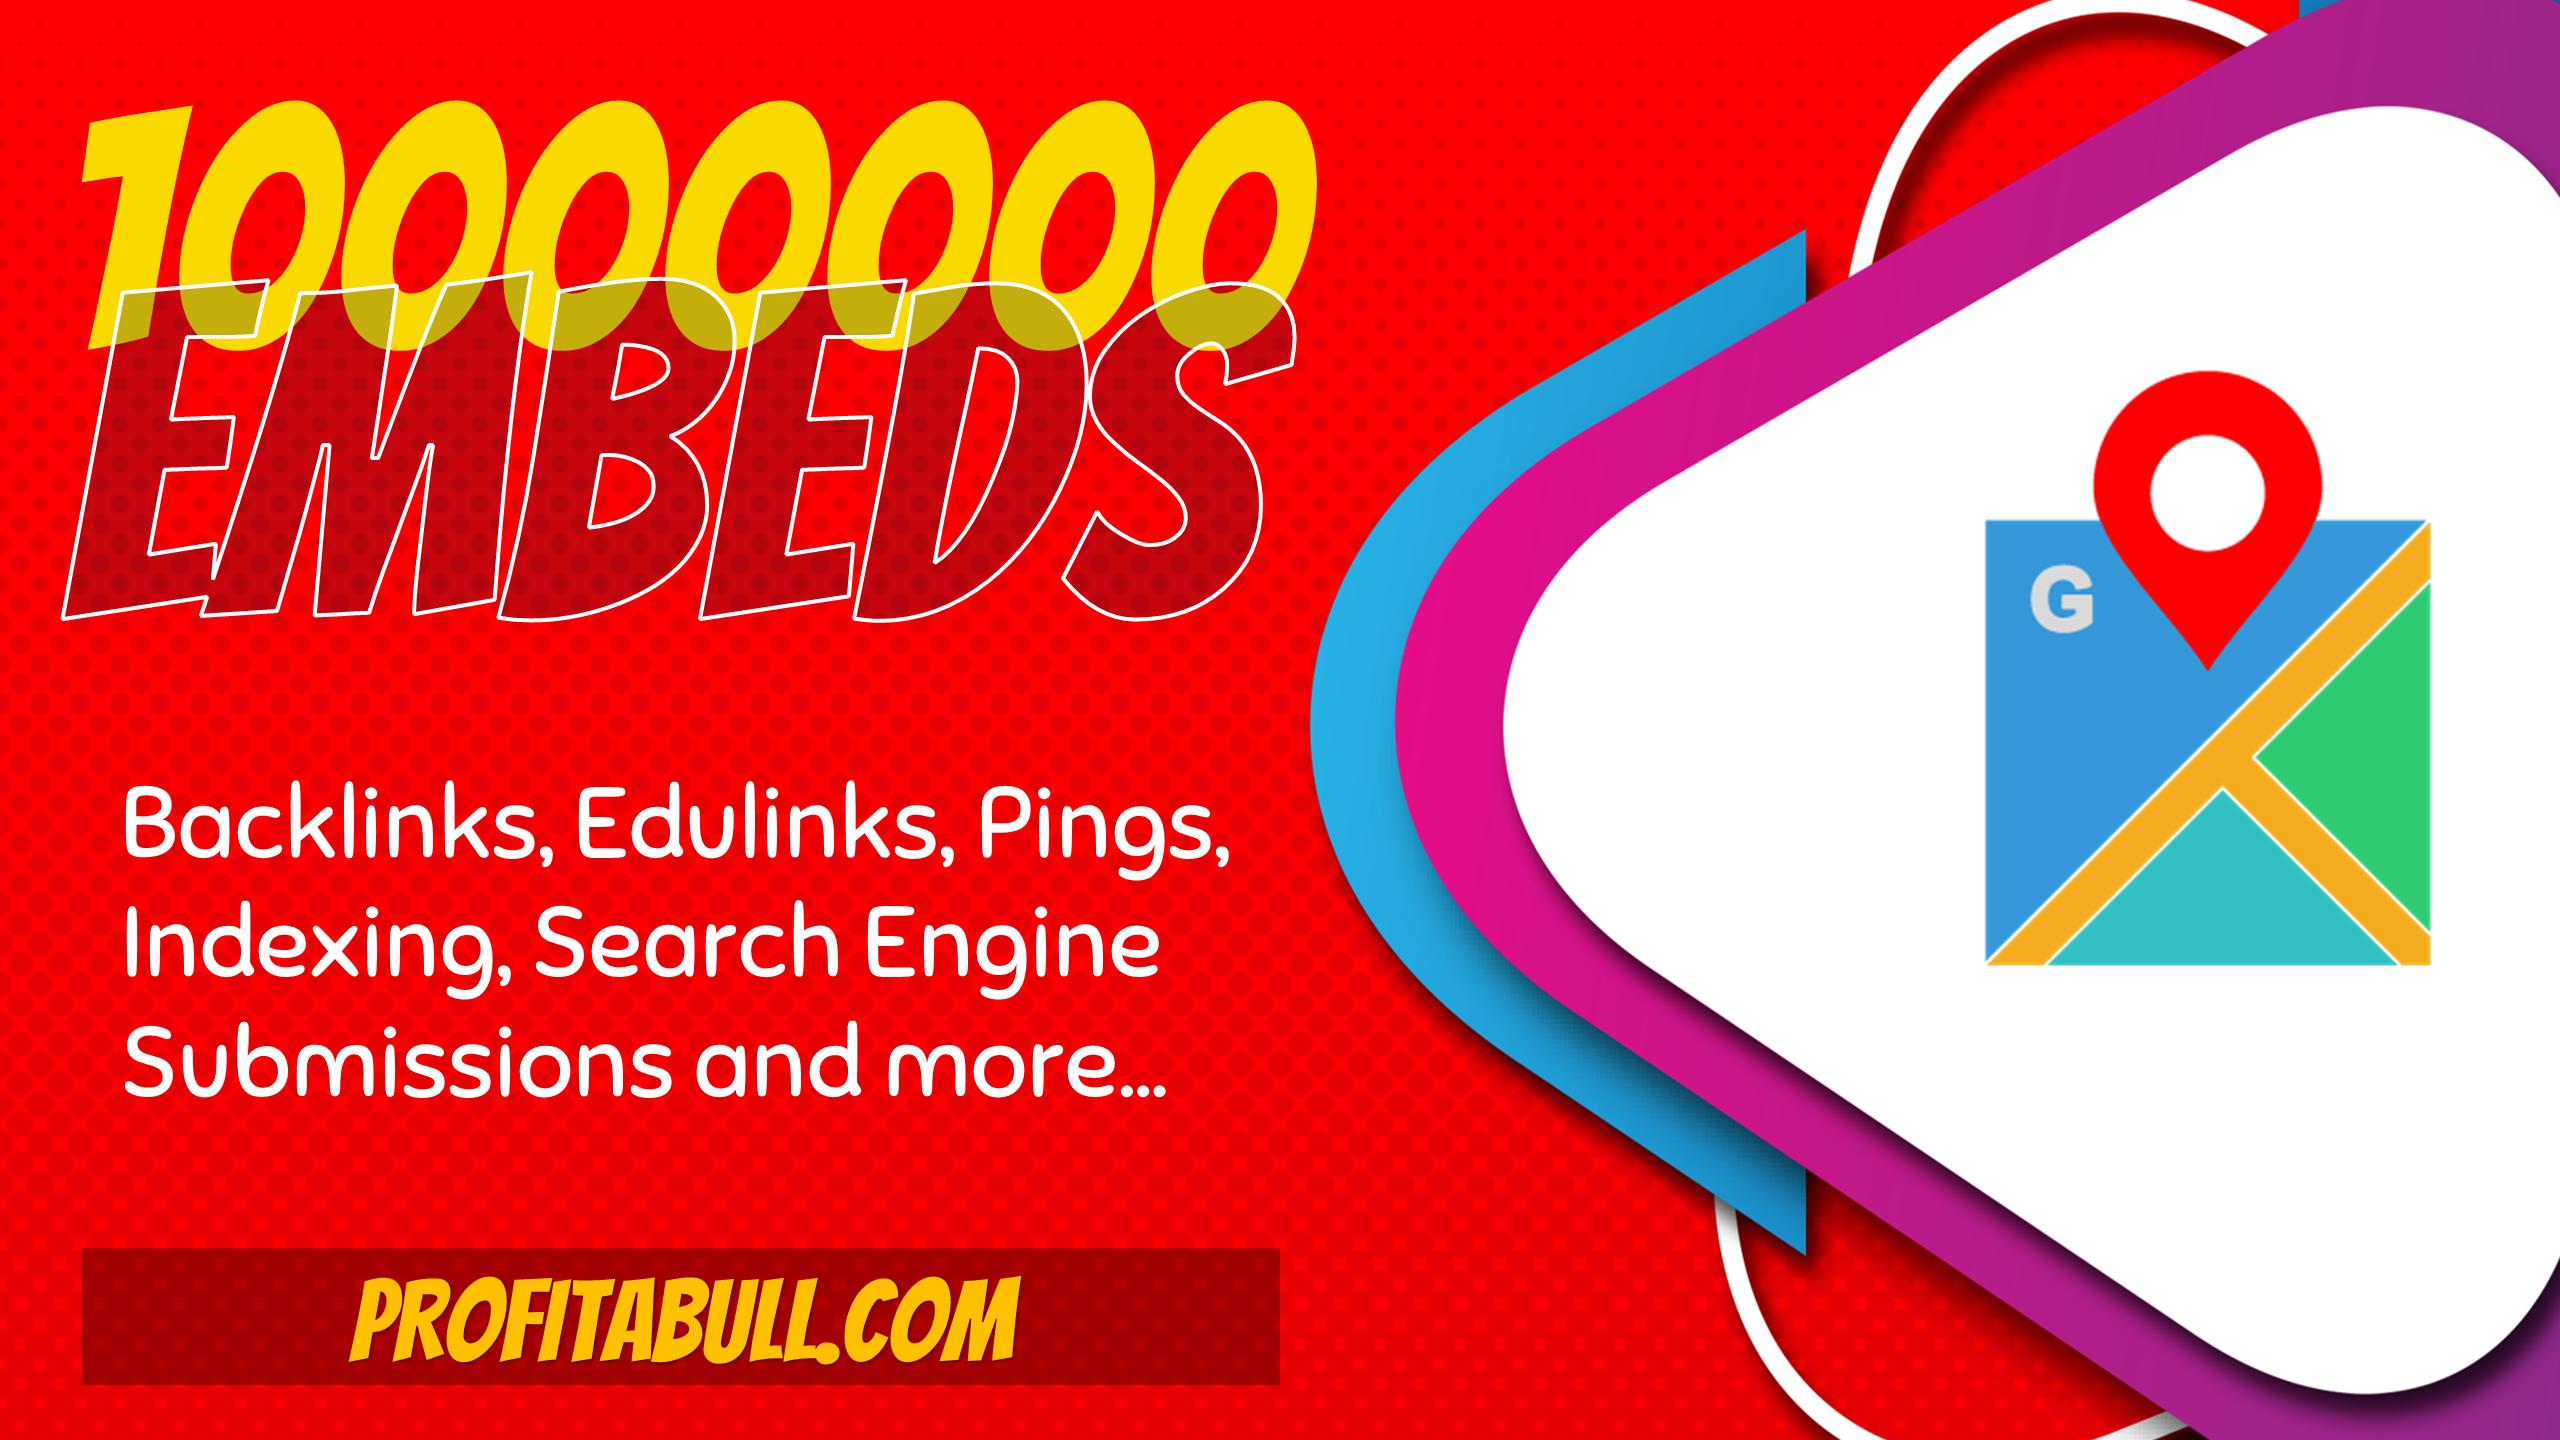 10 Million Google Map SEO Embeds